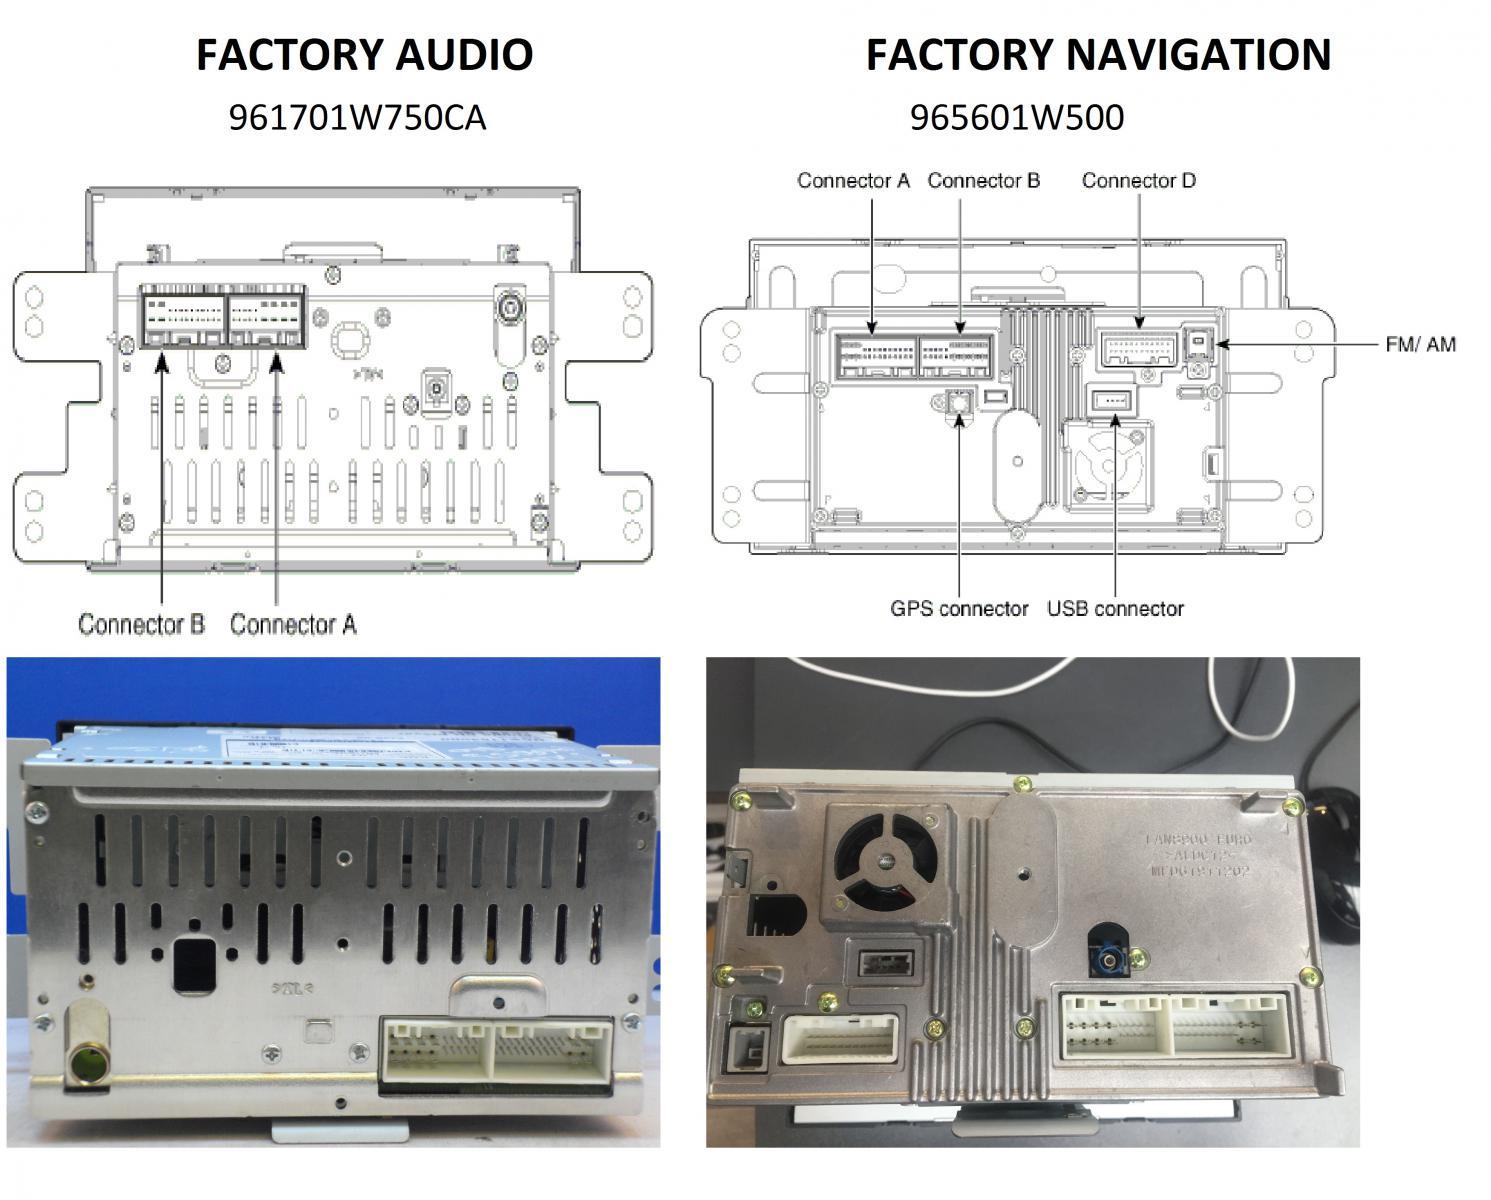 Kia Soul Factory Camera Wiring Diagram Great Installation Of Fuse Rio Navigation System Forum Rh Forums Com 2012 Sedona